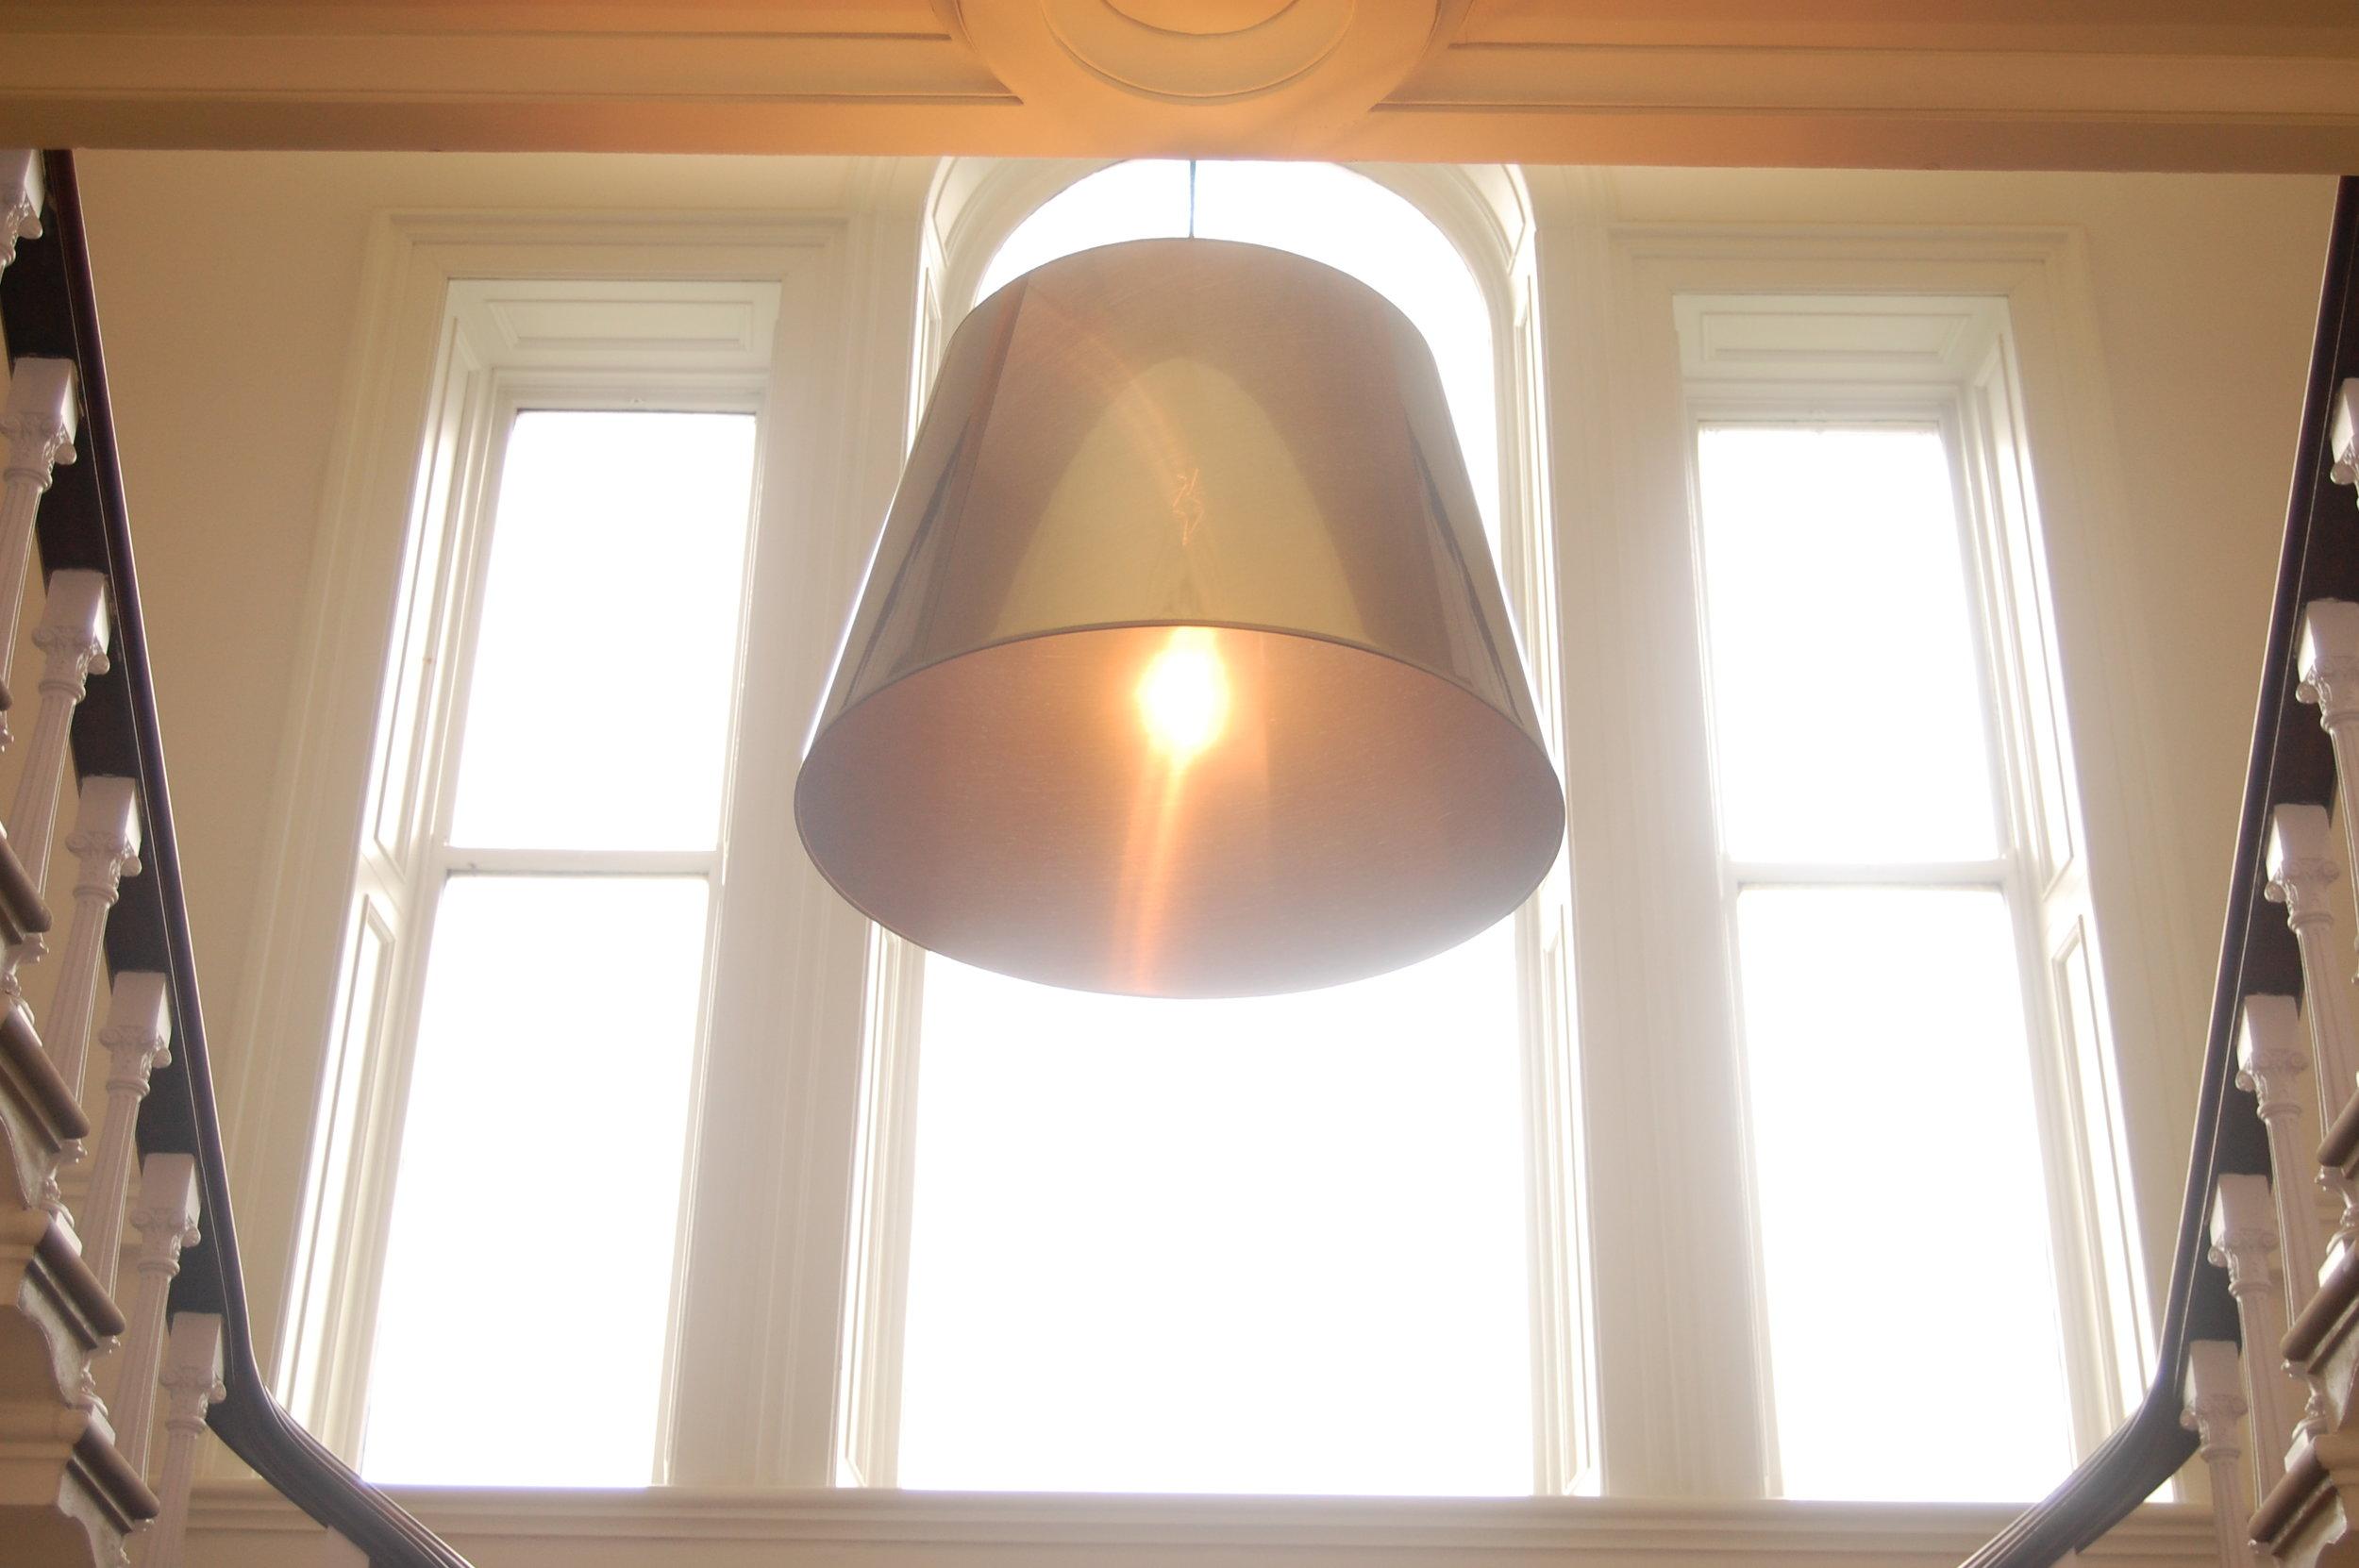 Commercial suspension lights